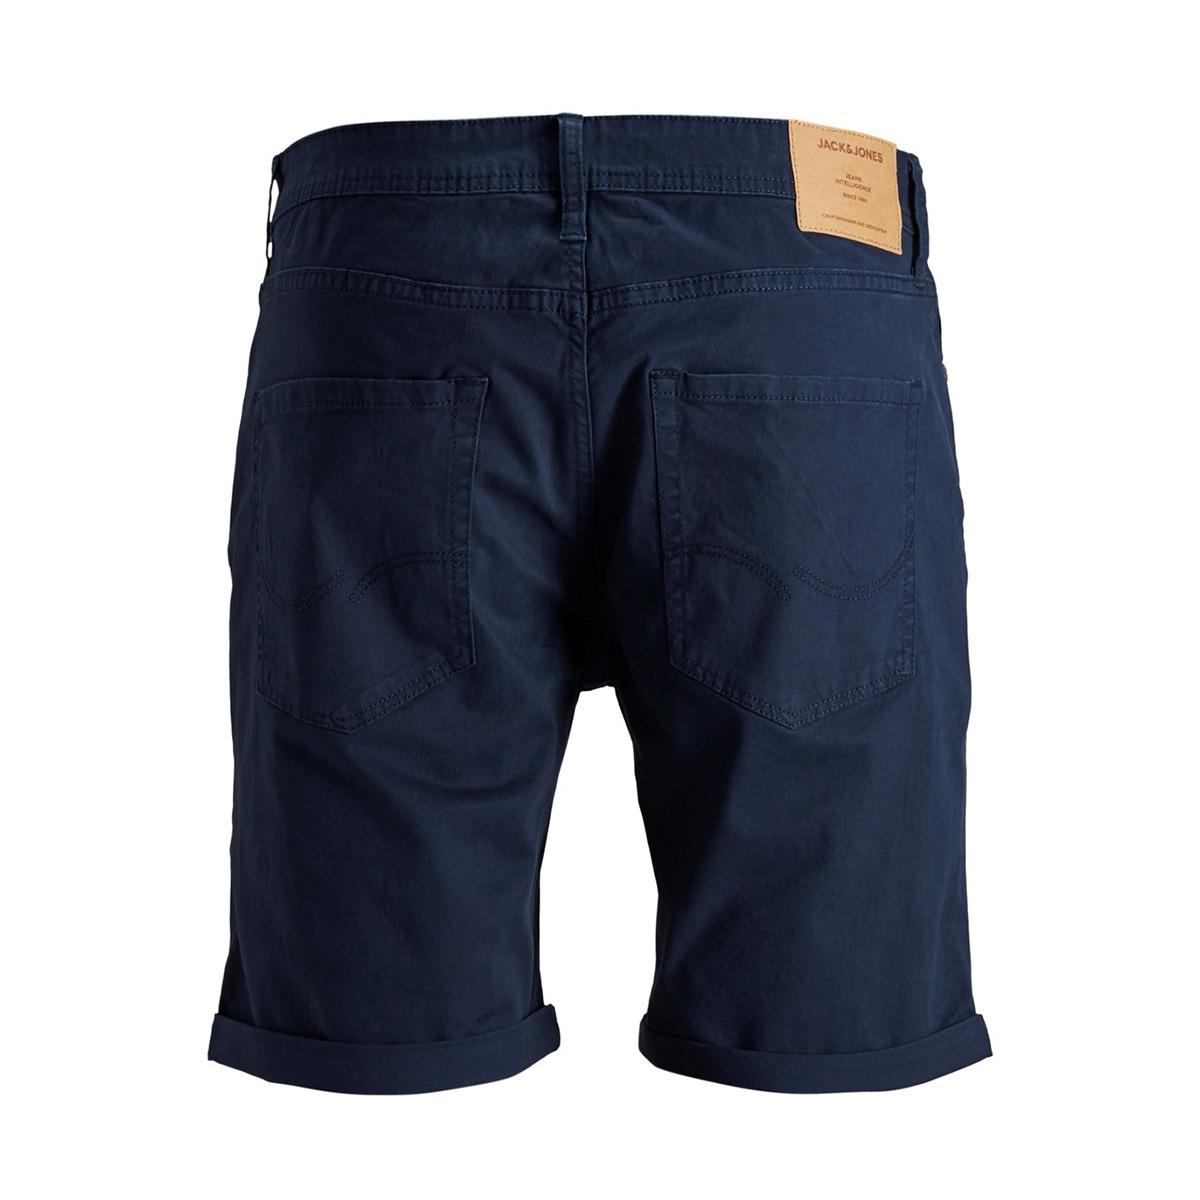 jjirick jjoriginal shorts ww 01 12146165 jack & jones korte broek black iris